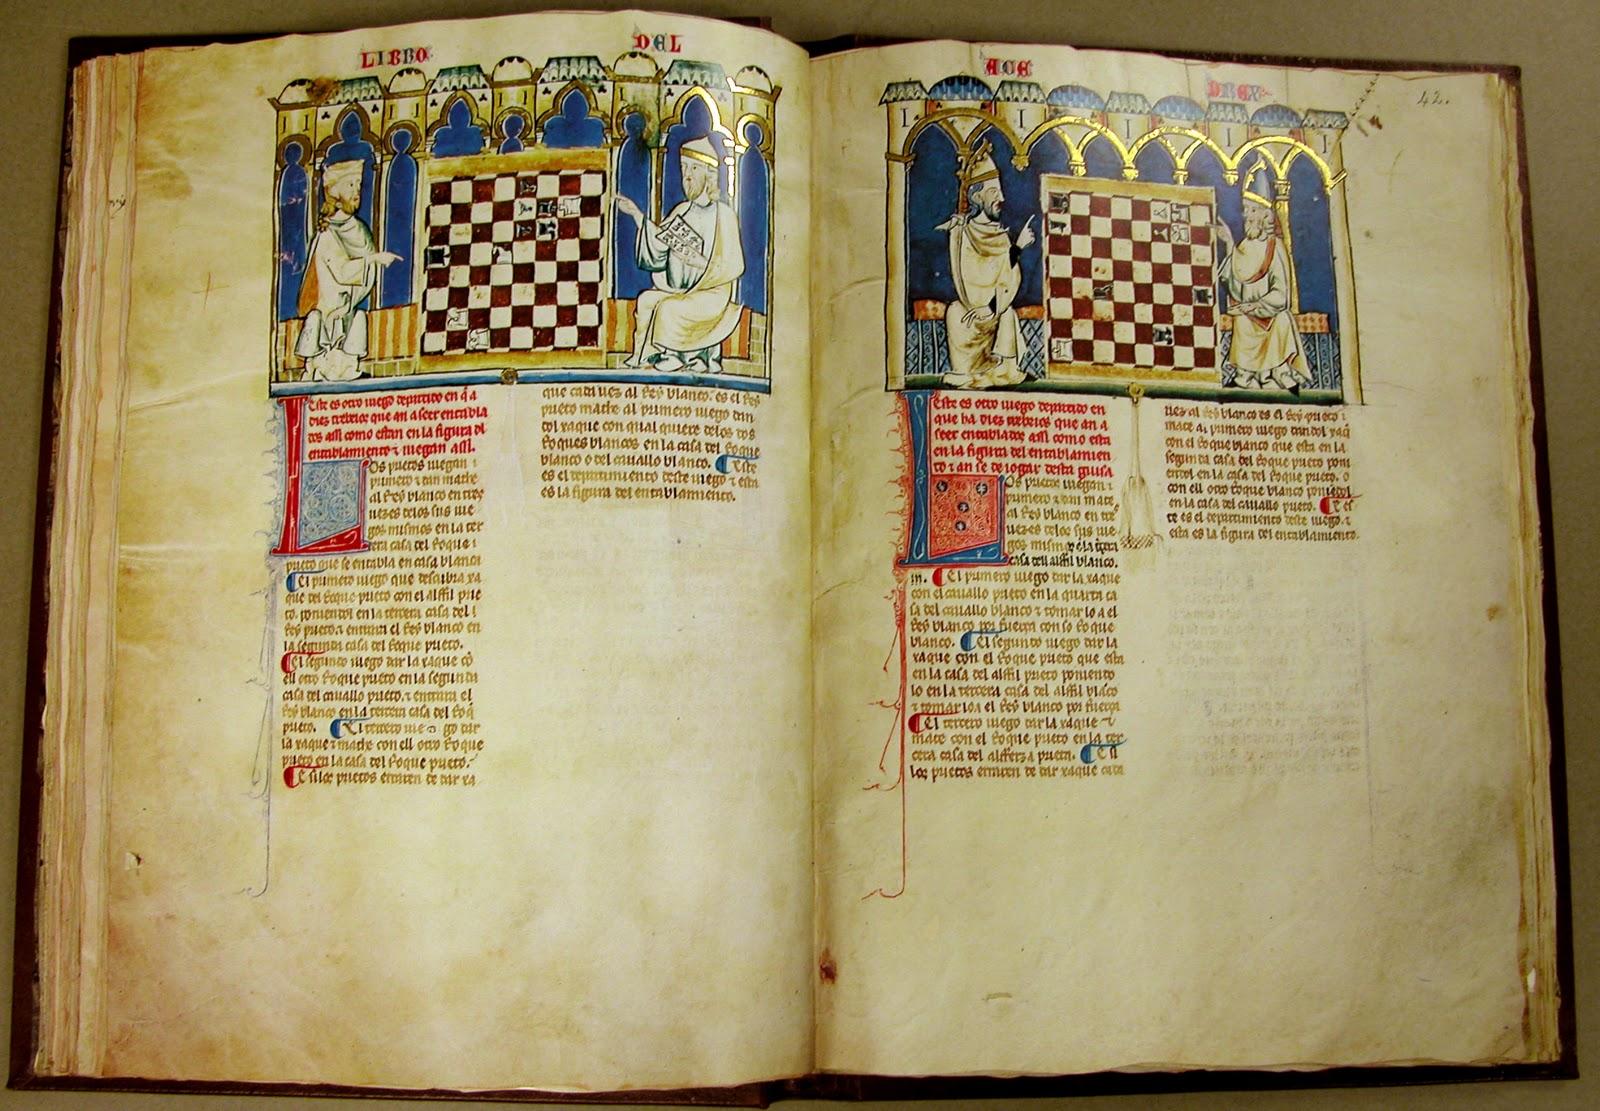 12th_century_old_books.jpg